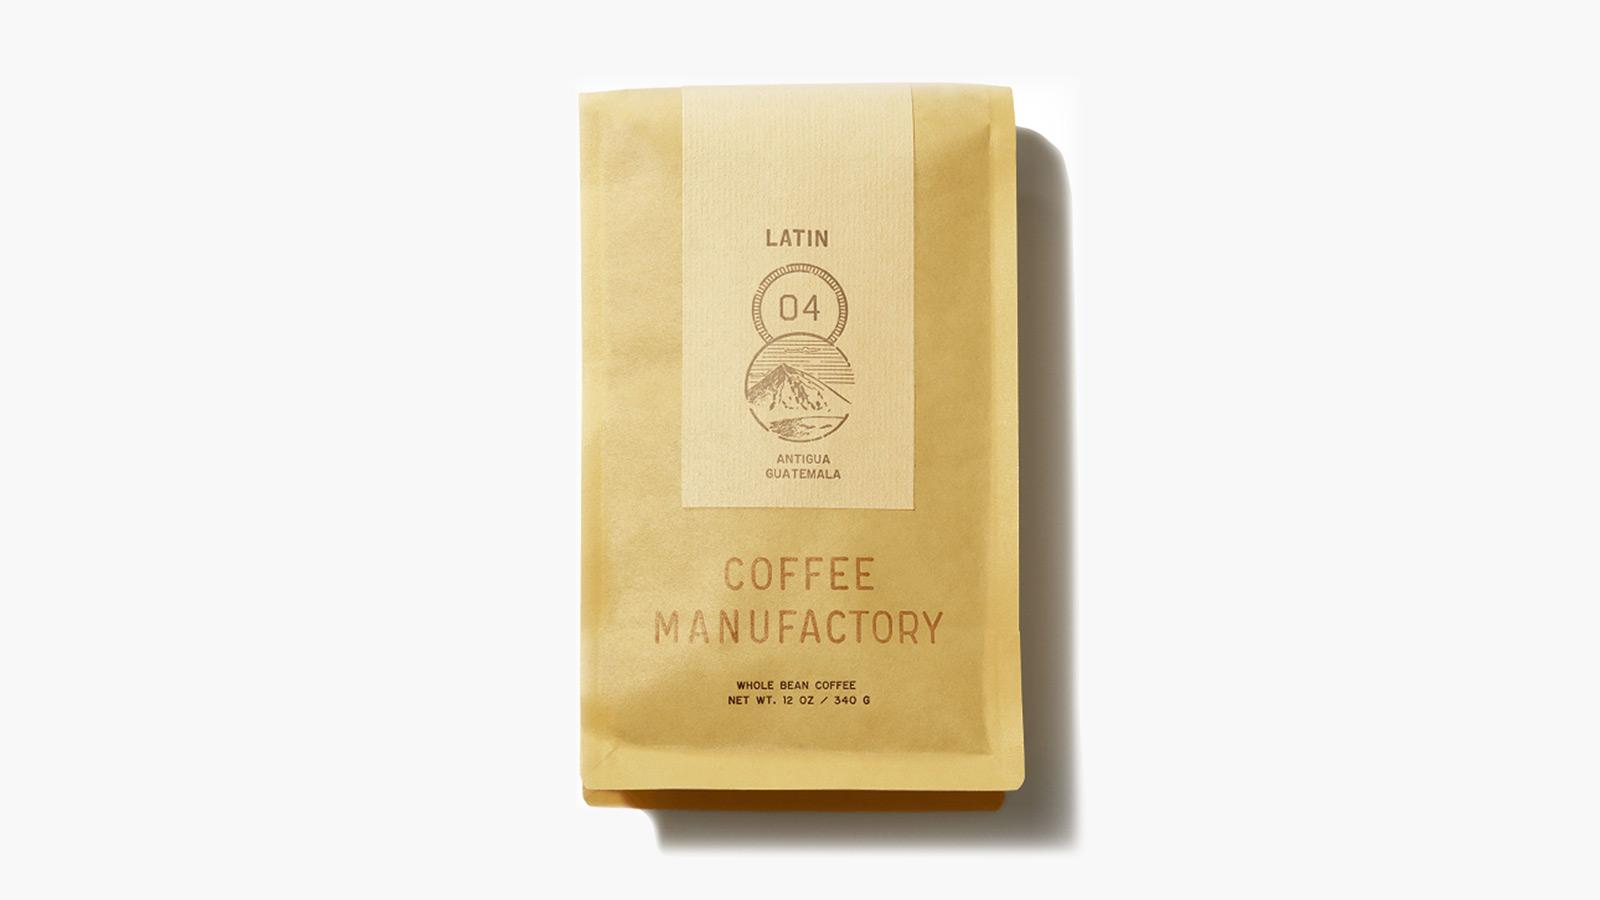 Coffee Manufactory El Salvador Metapan